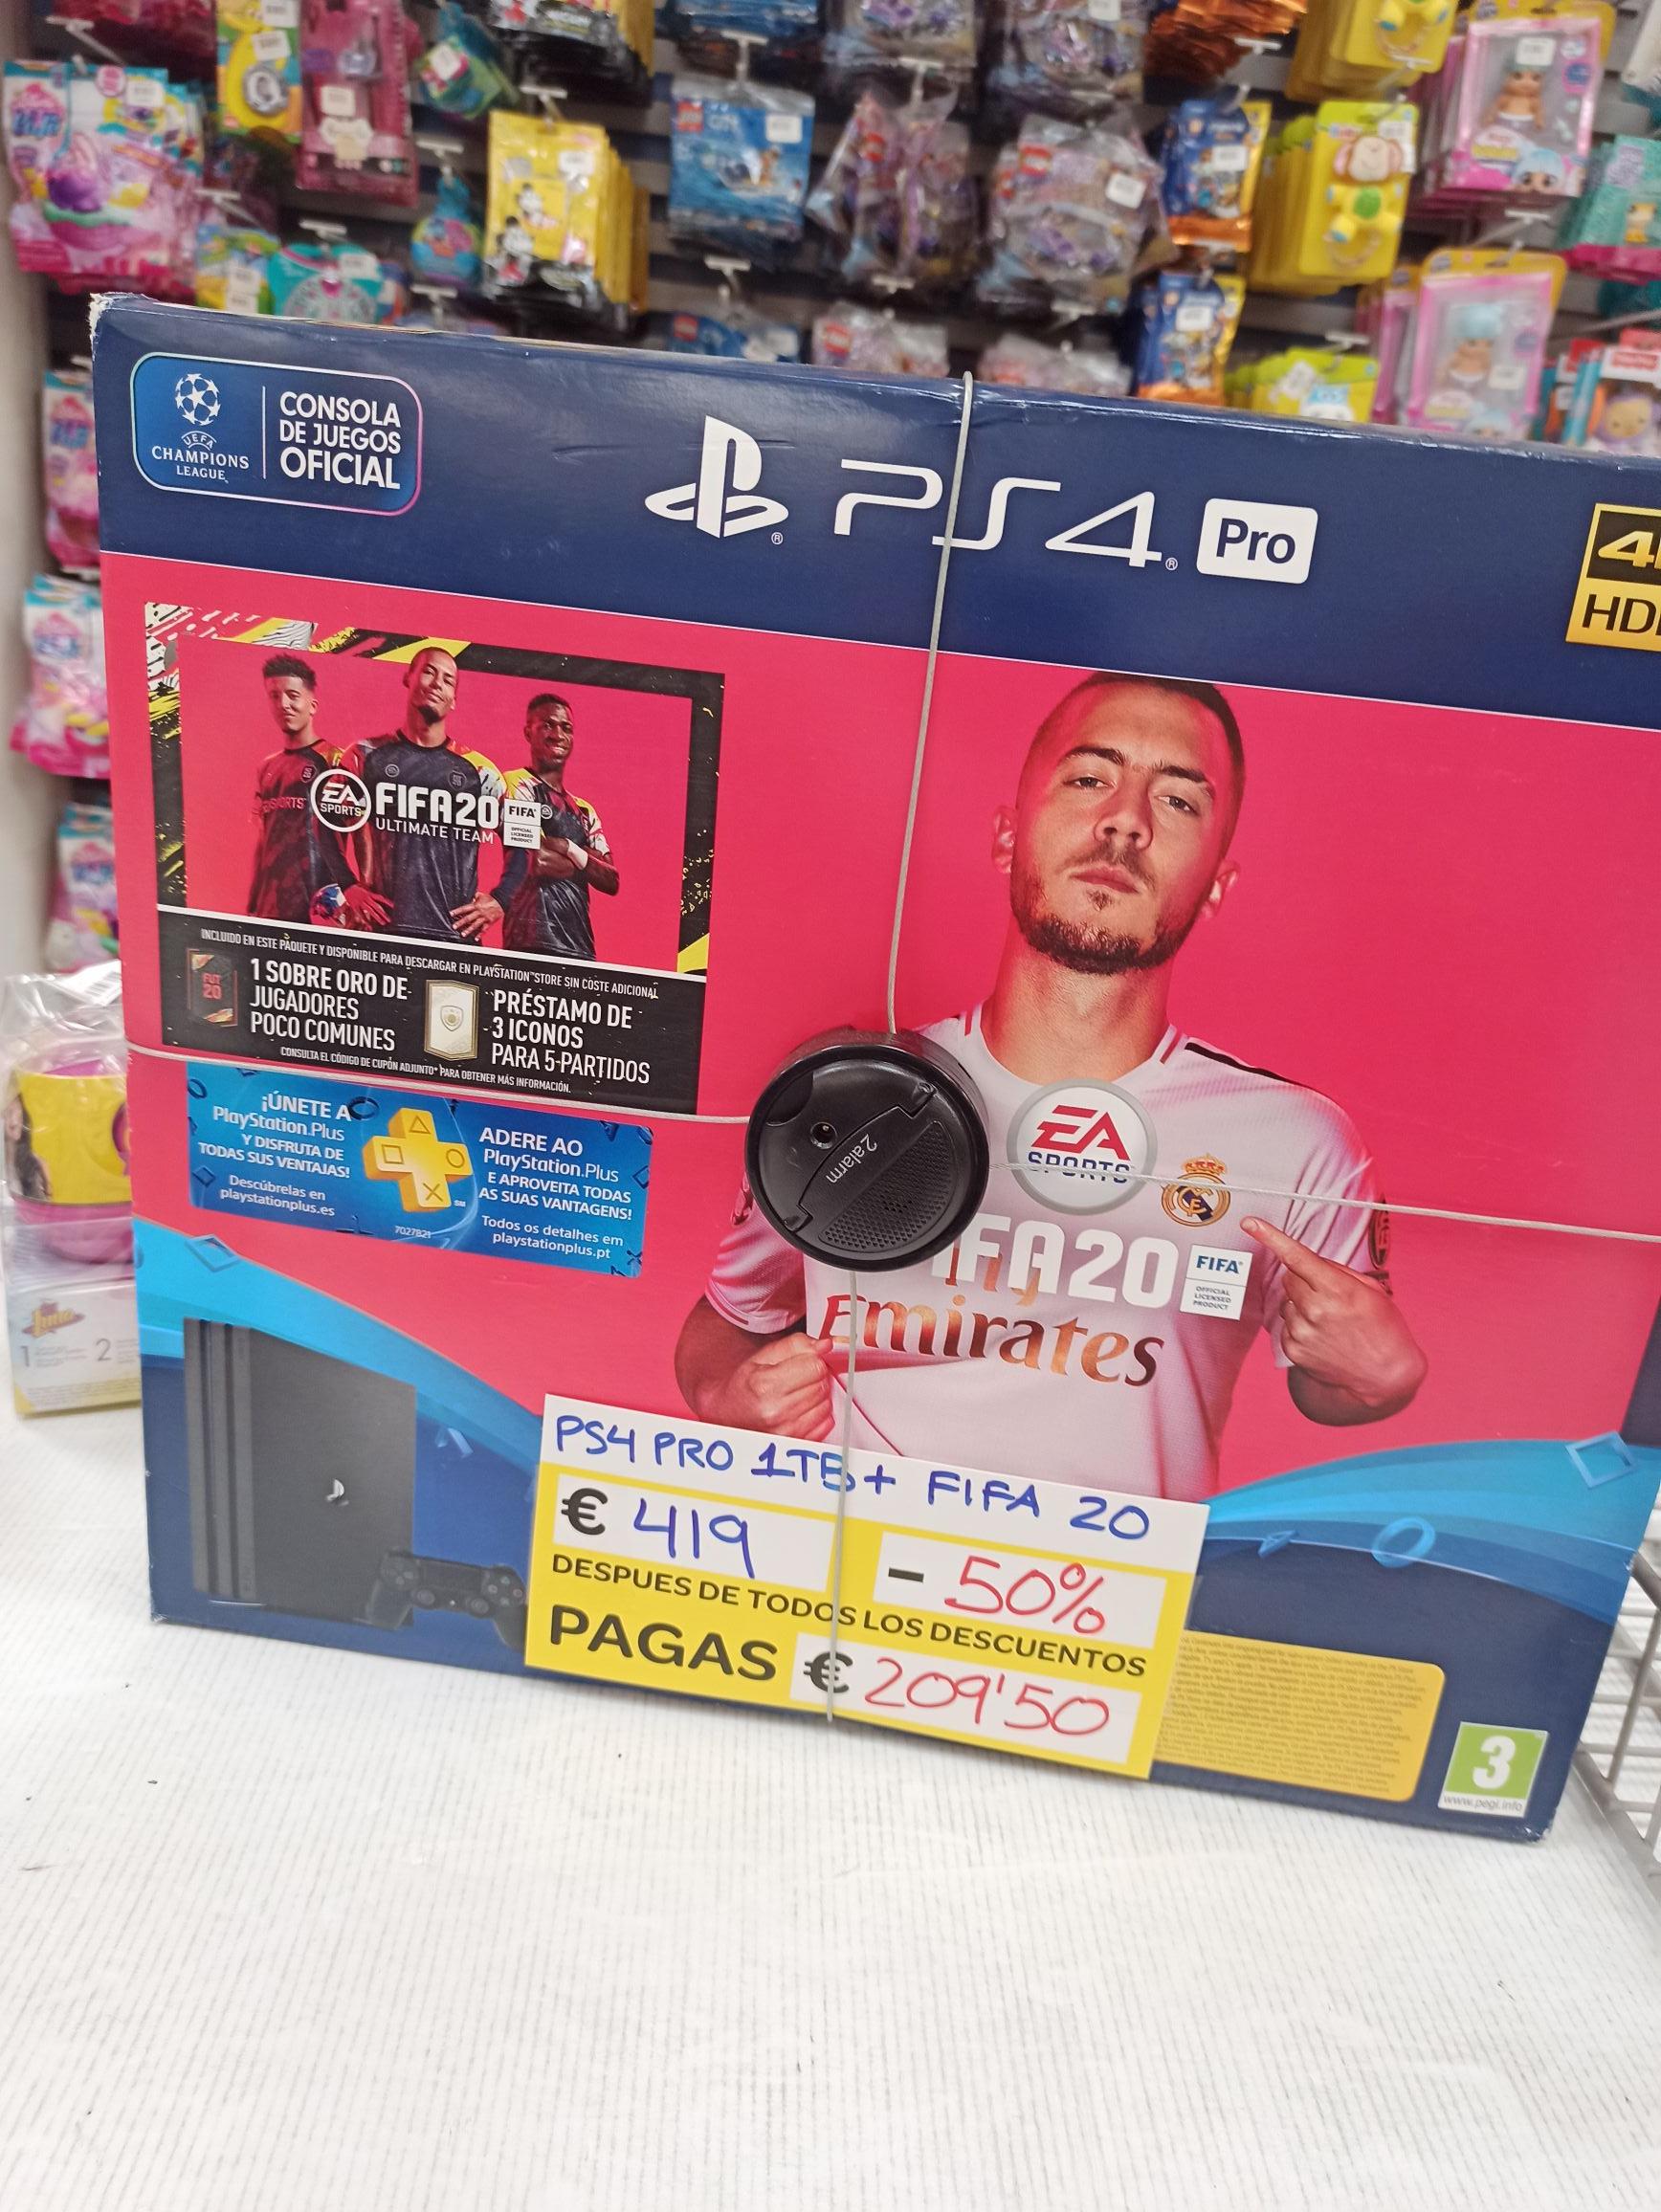 Ps4 Pro 1tb + Fifa 20 Outlet Carrefour Los Rosales